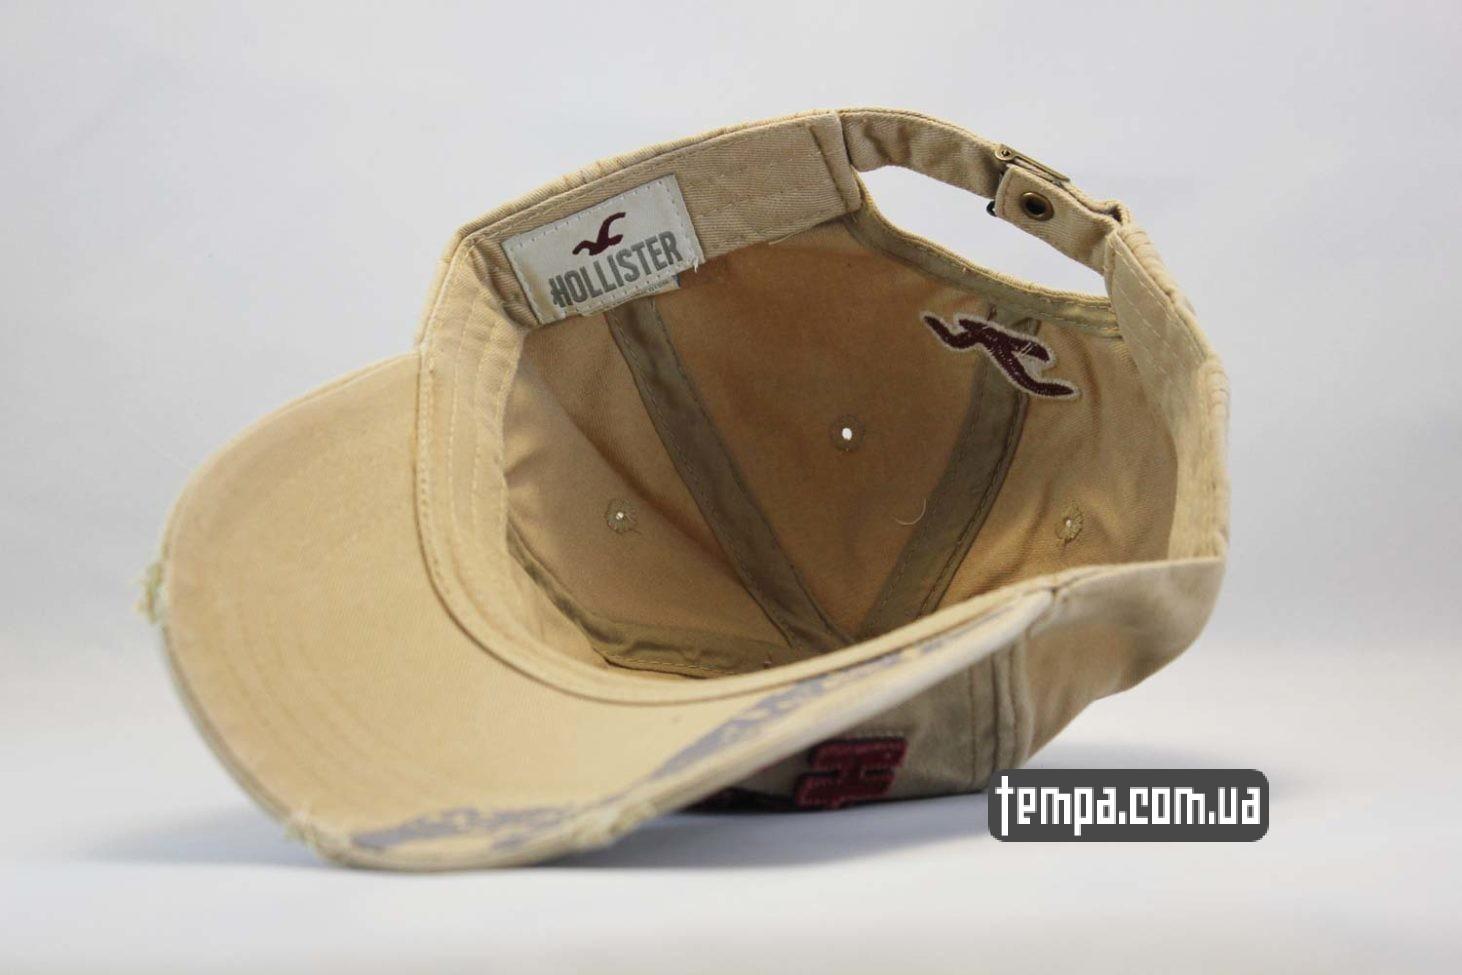 hollister ukraine купить кепка бейсболка hollister company бежевая джинсовая